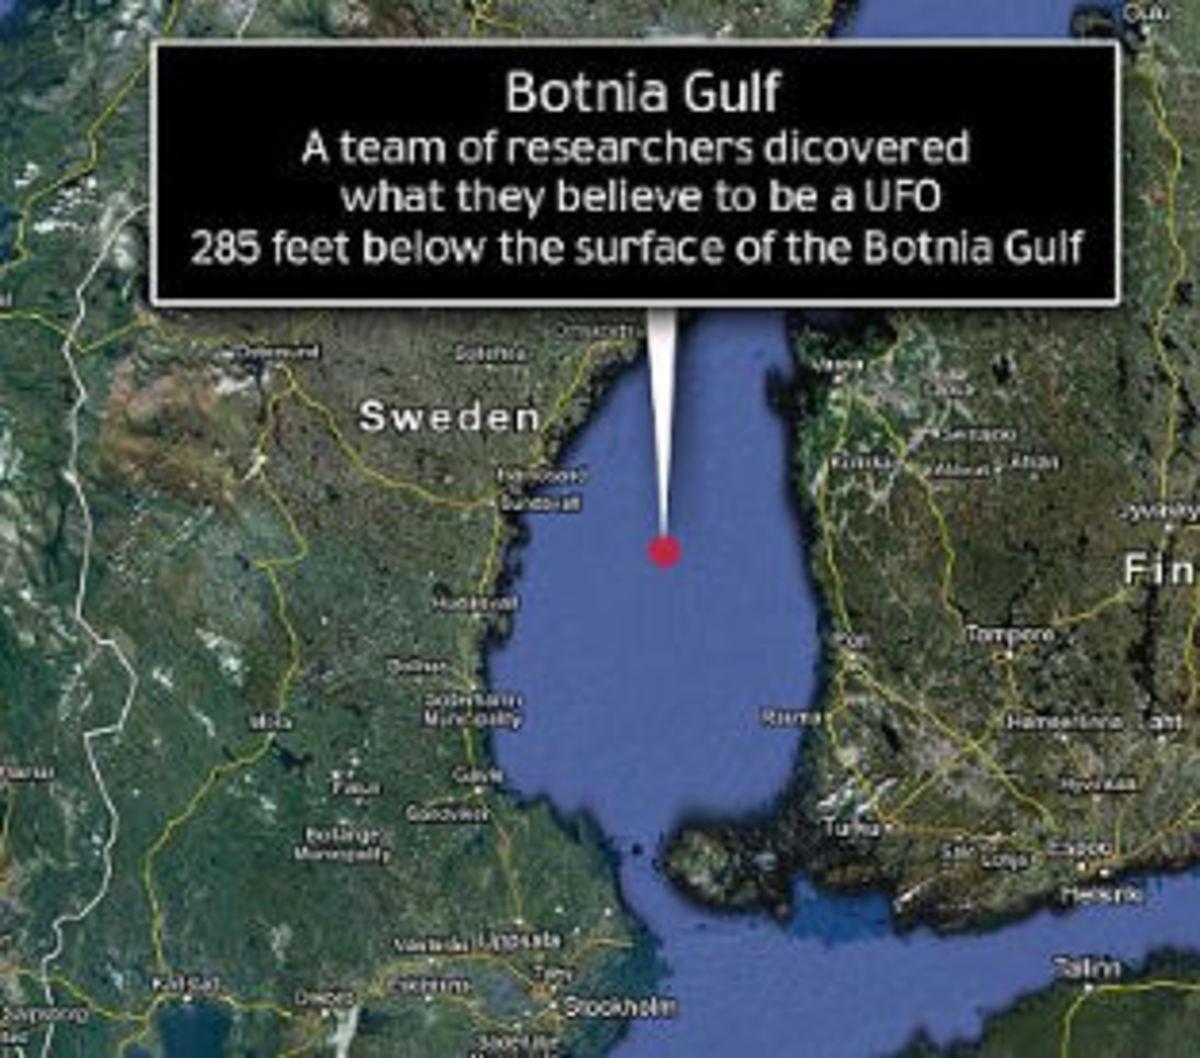 Botnia Sea Anti-submarine net map